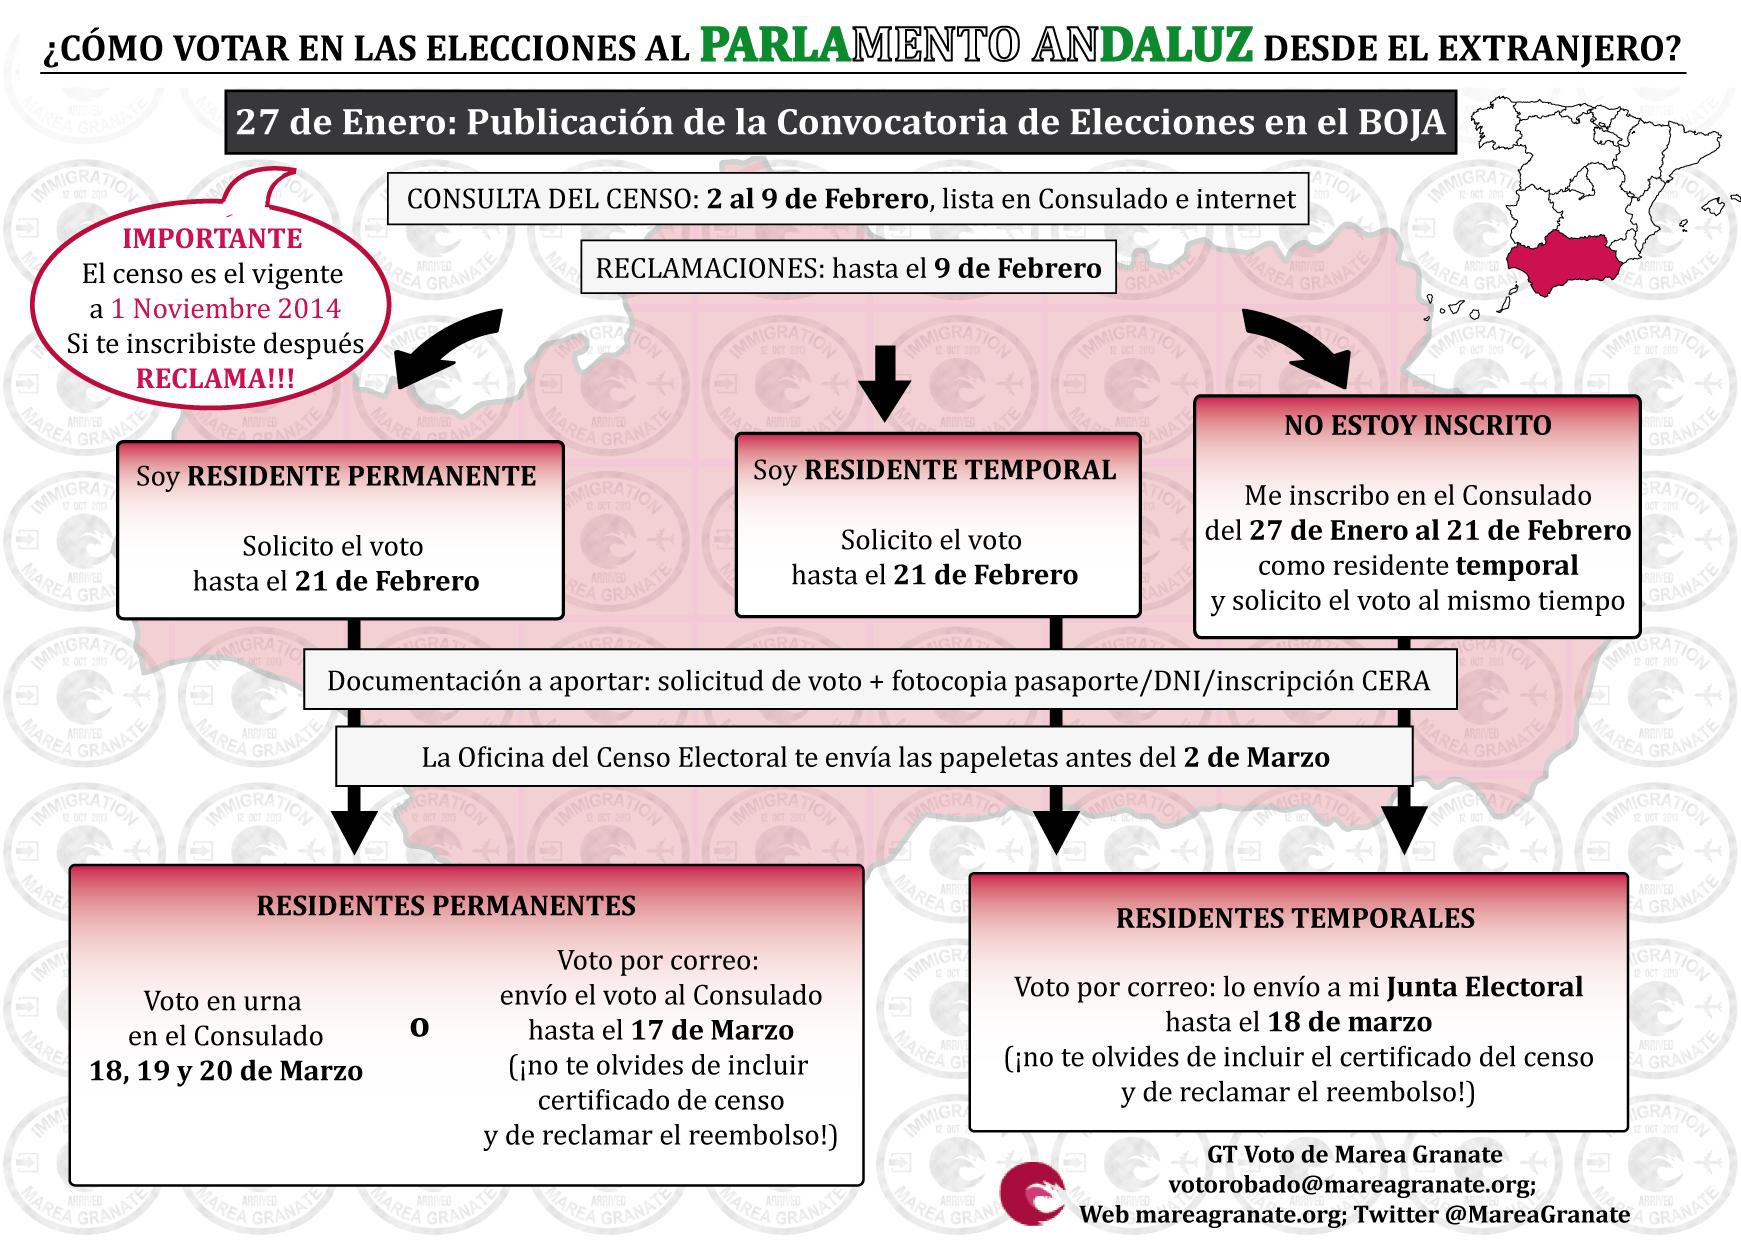 Elecciones al parlamento andaluz 2015 marea granatemarea for Oficina del censo electoral